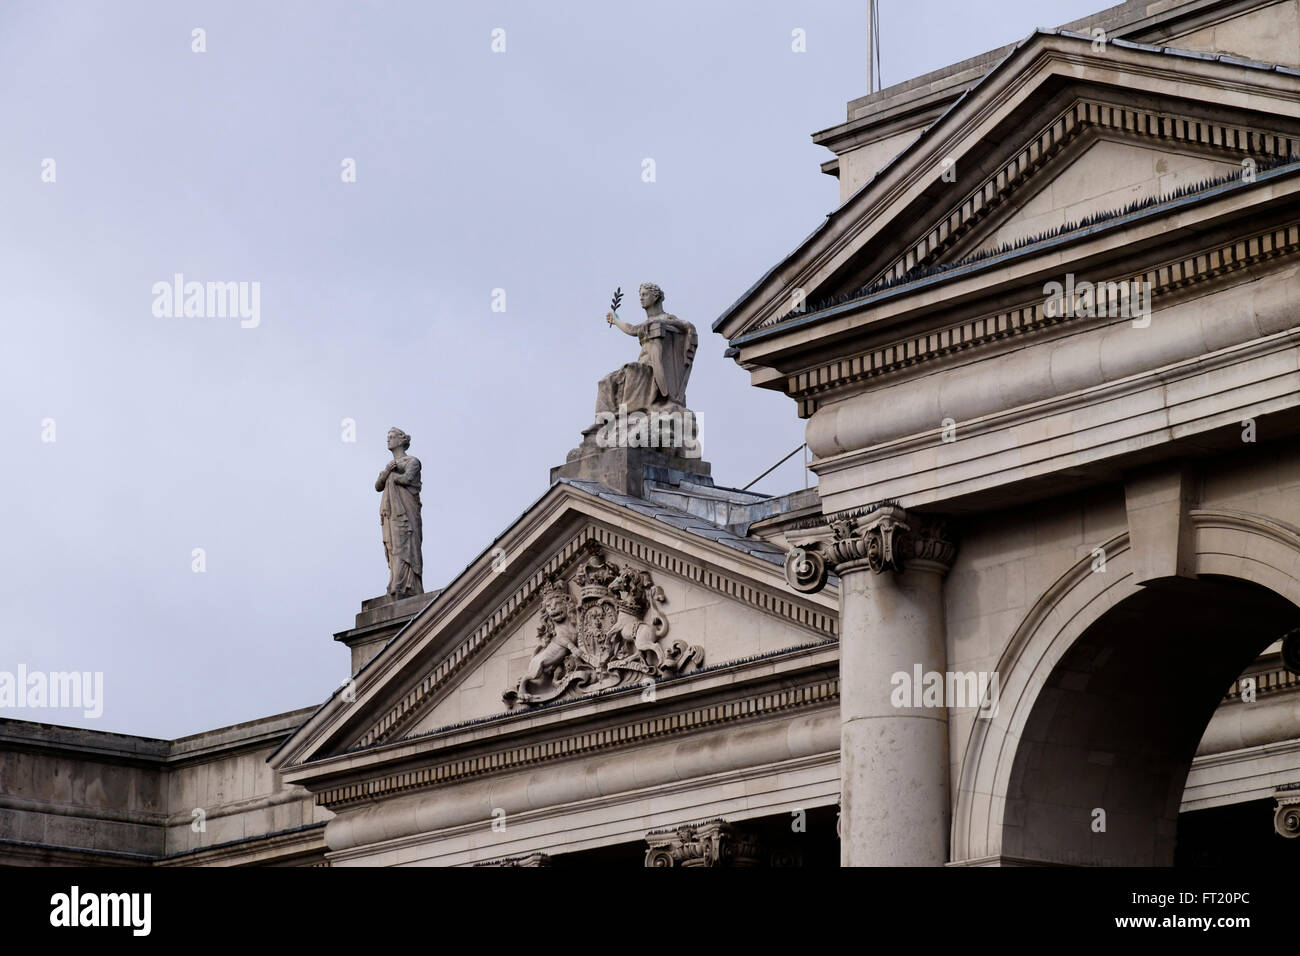 Headquarters of the Bank of Ireland, former Irish Houses of Parliament, Dublin, Republic of Ireland, Europe Stock Photo